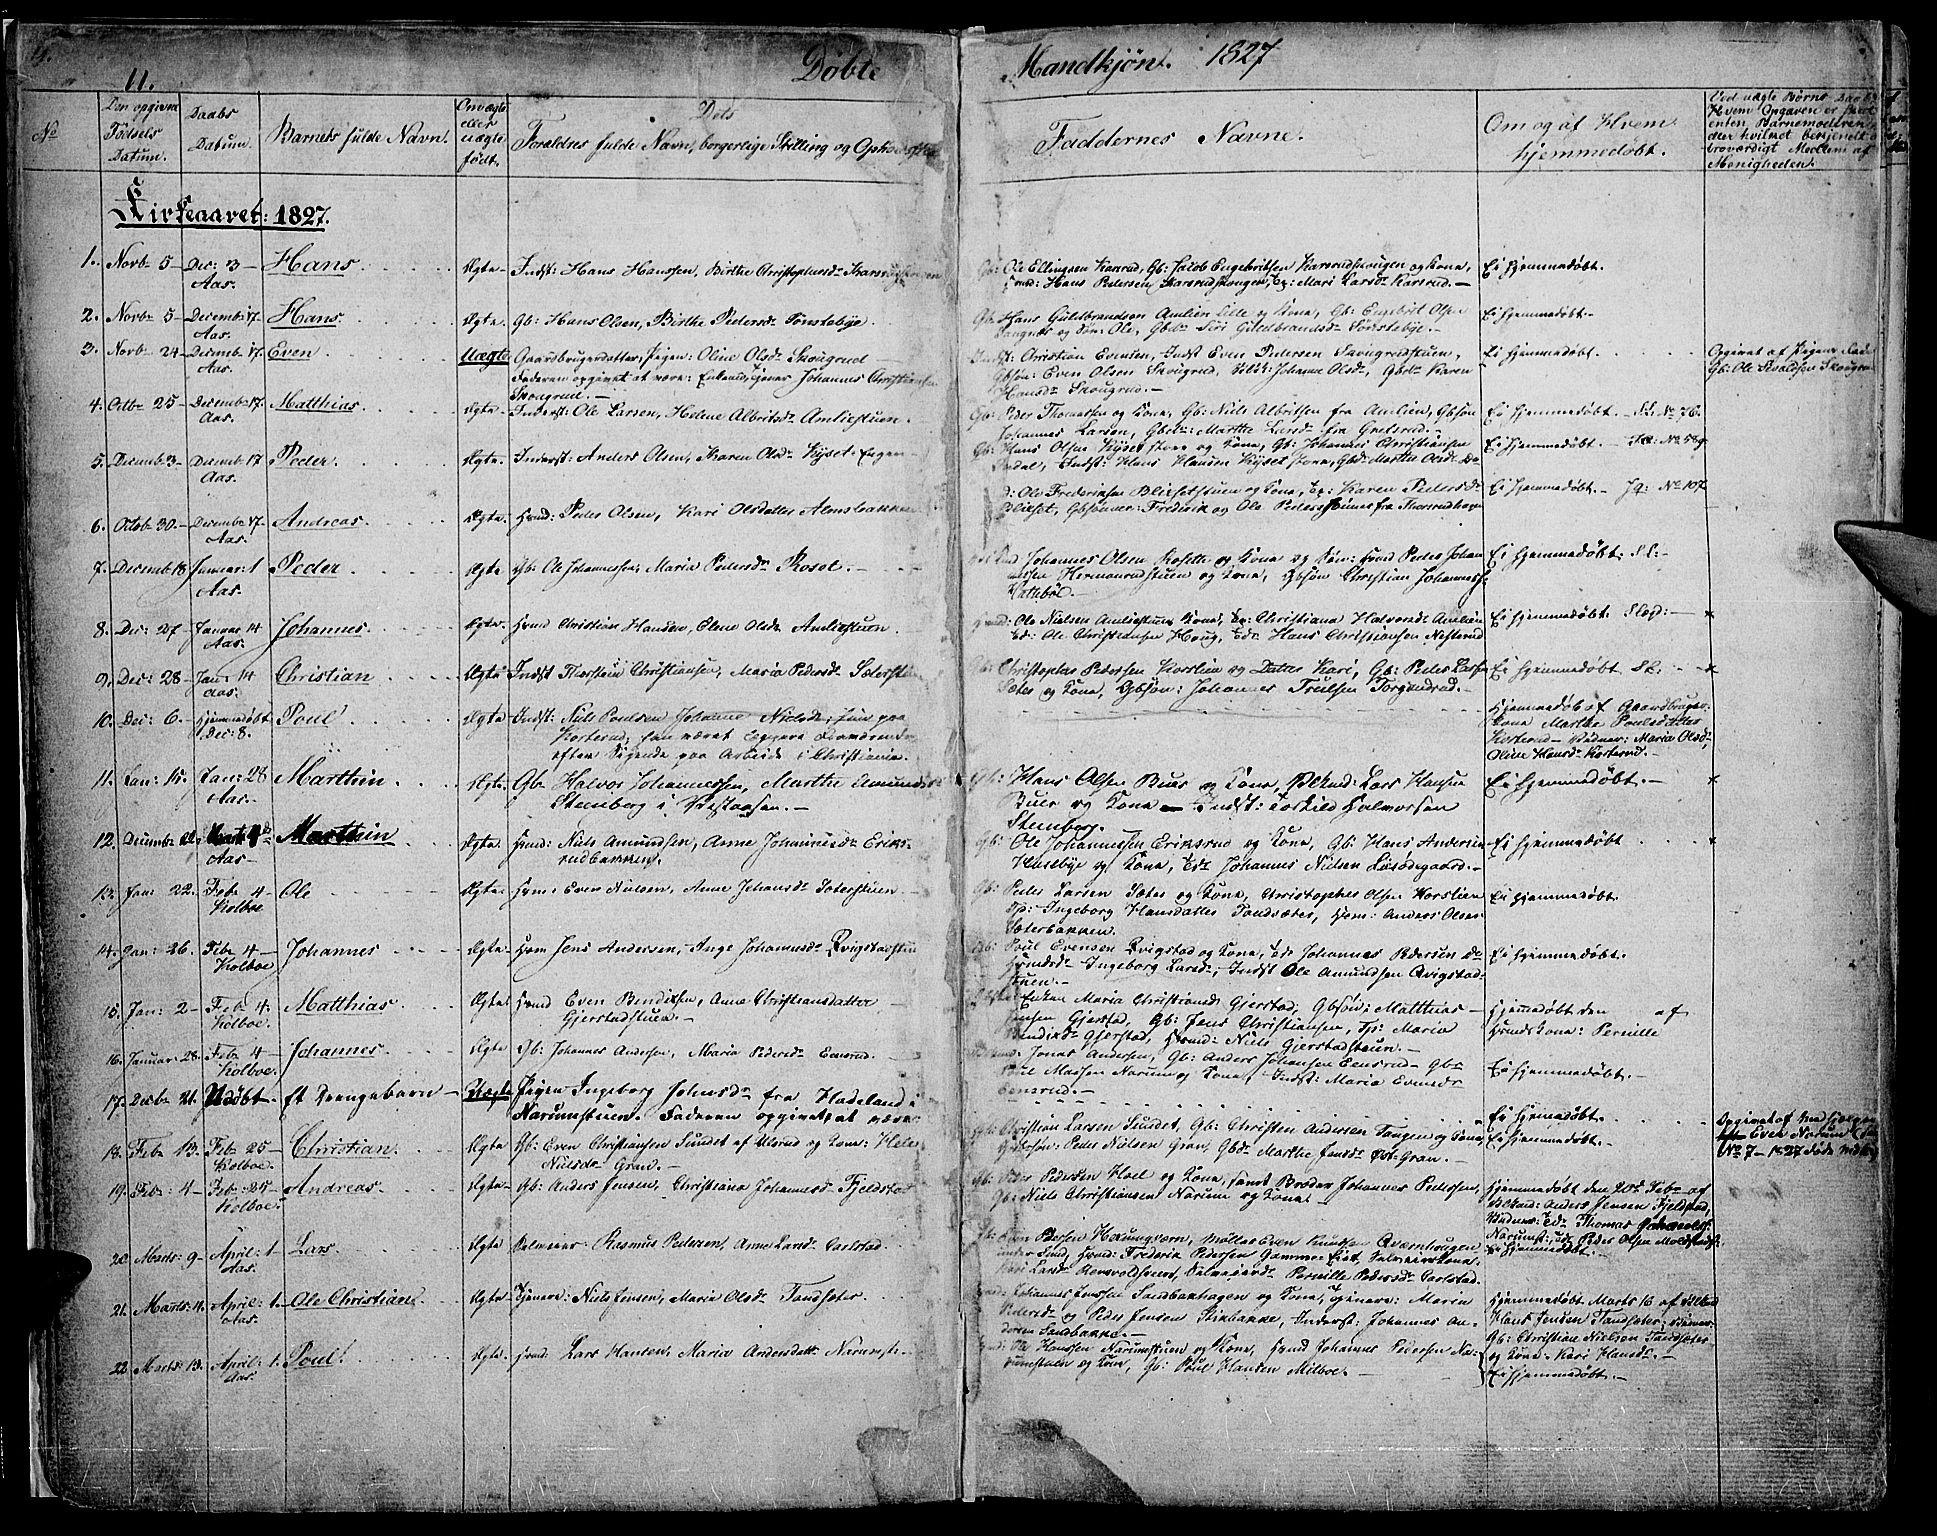 SAH, Vestre Toten prestekontor, H/Ha/Haa/L0002: Ministerialbok nr. 2, 1825-1837, s. 11